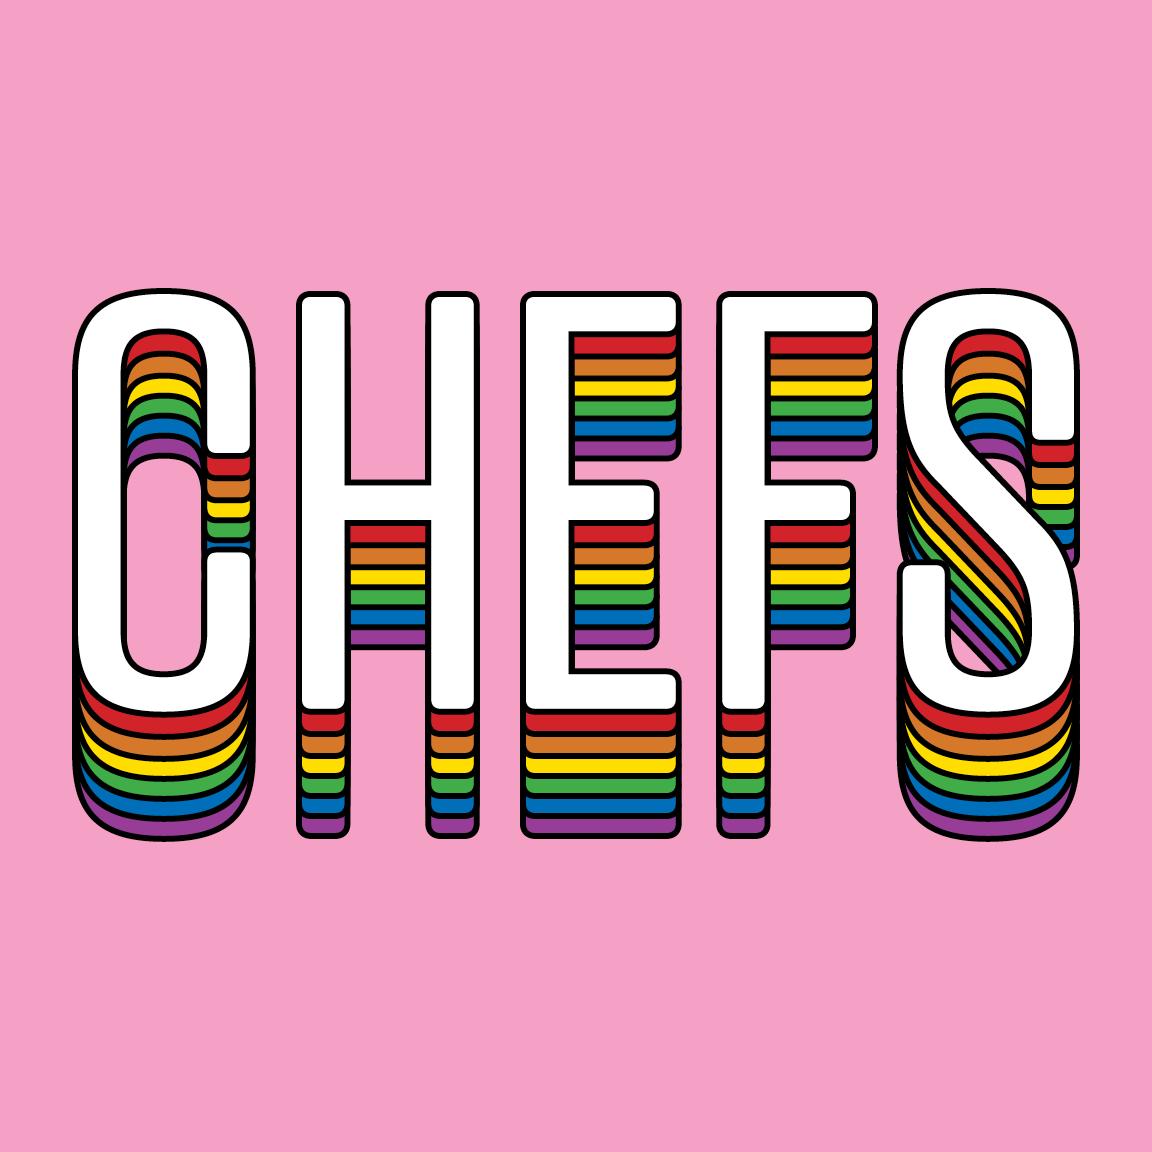 CHEFS_Jarrybriefs_Title.png